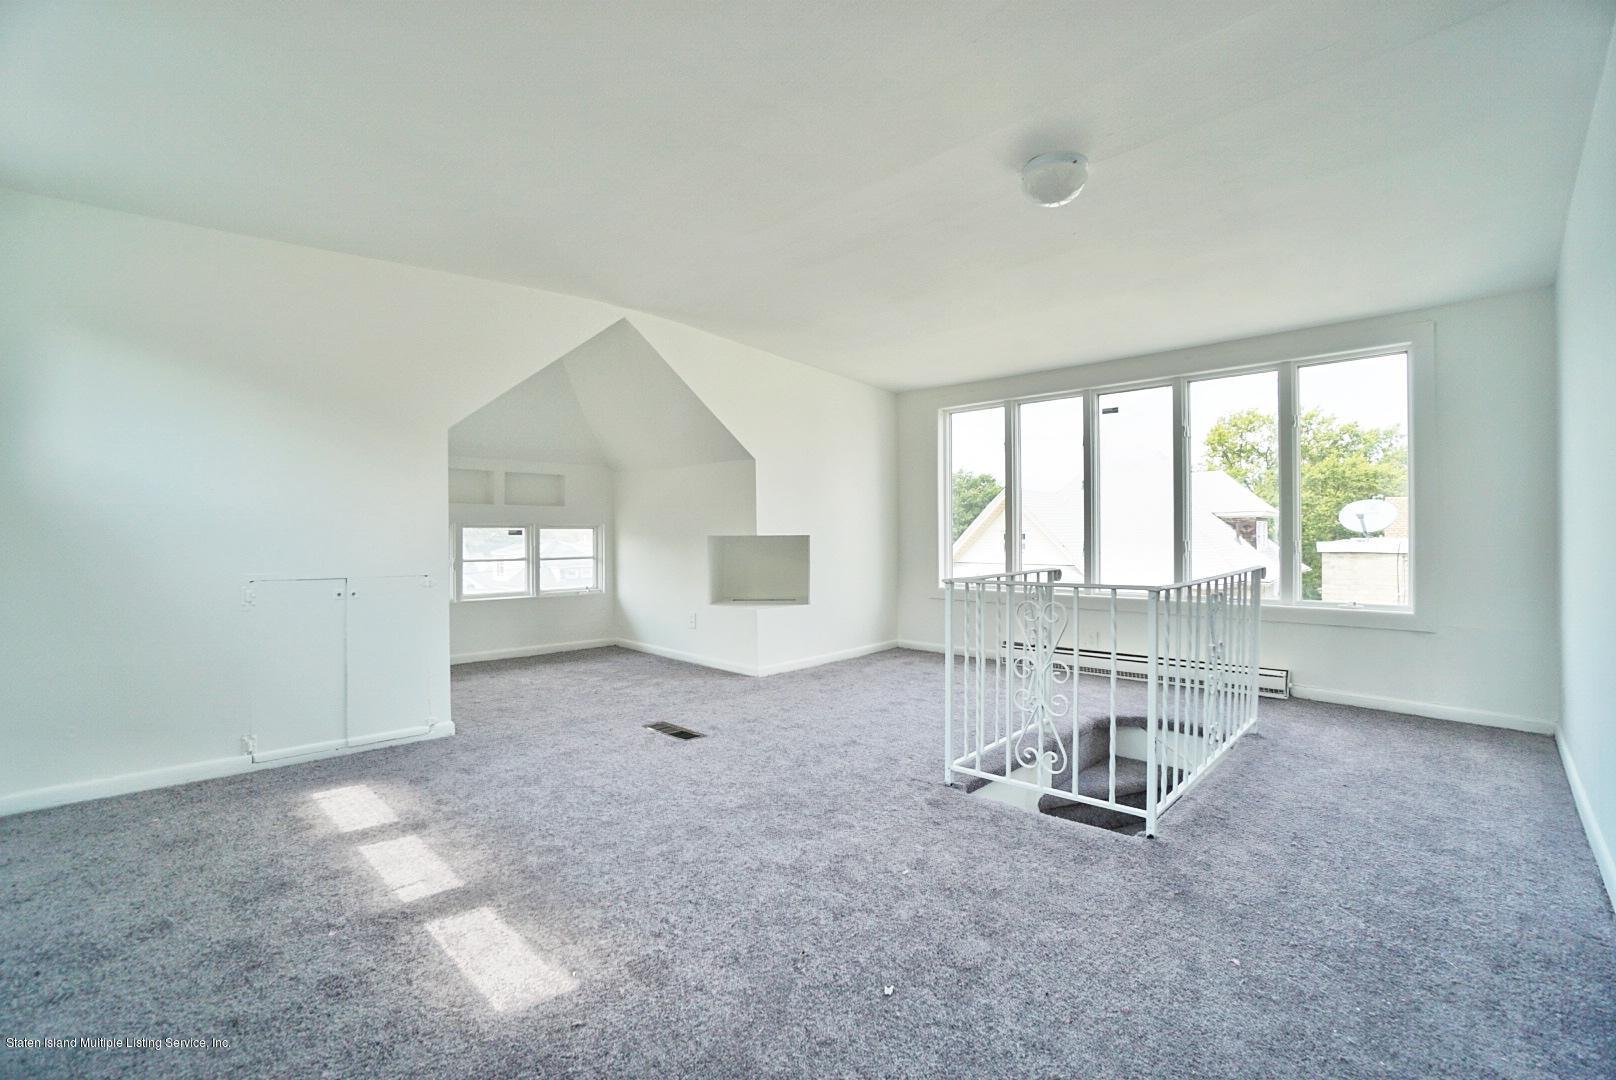 Single Family - Detached 53 Dubois Avenue  Staten Island, NY 10310, MLS-1128749-40